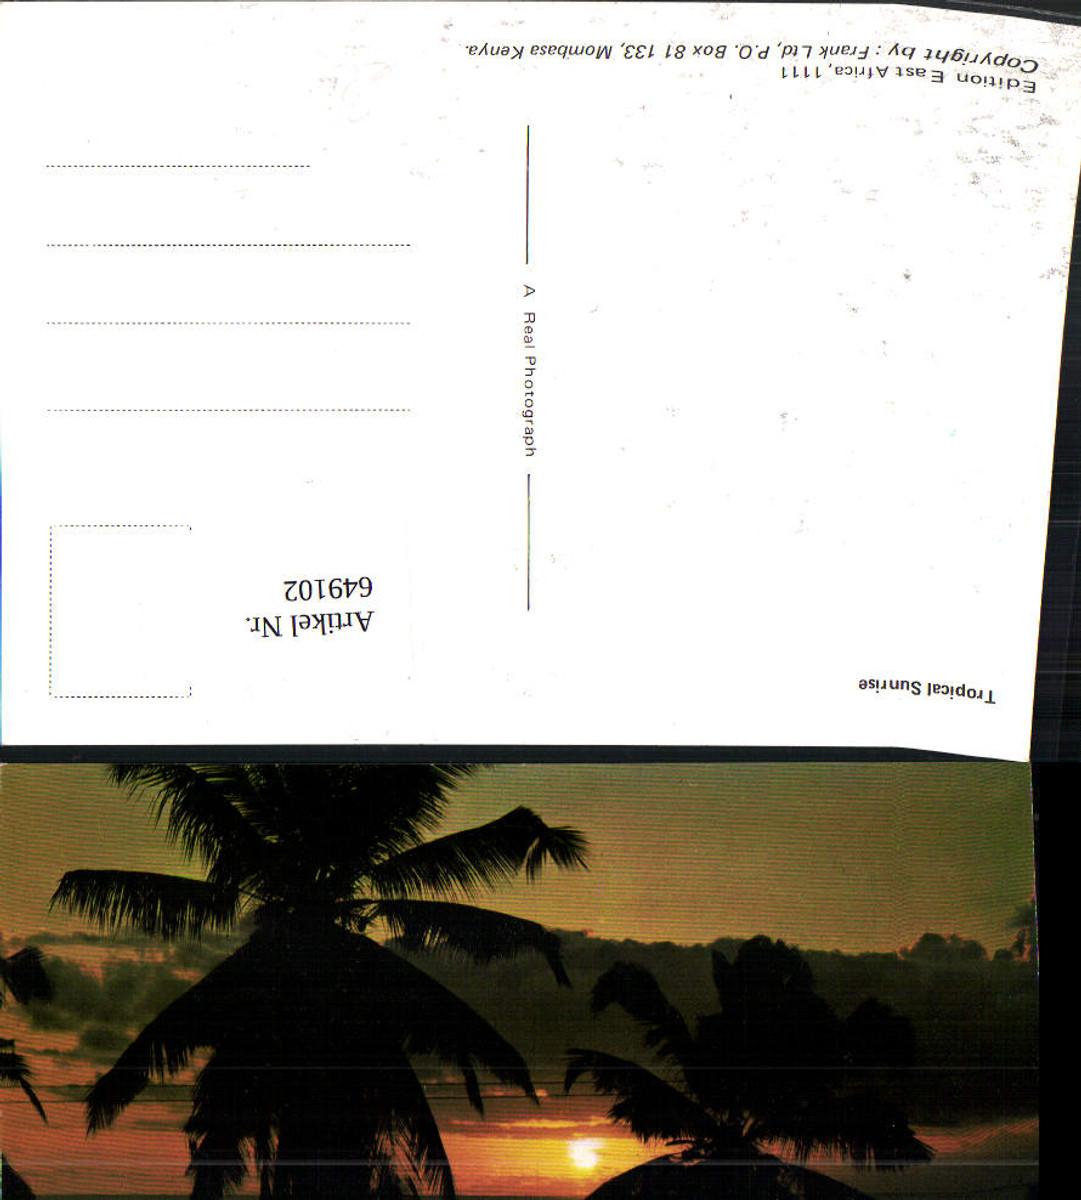 649102,Tropical Sunrise Mombasa Kenya Kenia Palmen Sonnenuntergang günstig online kaufen